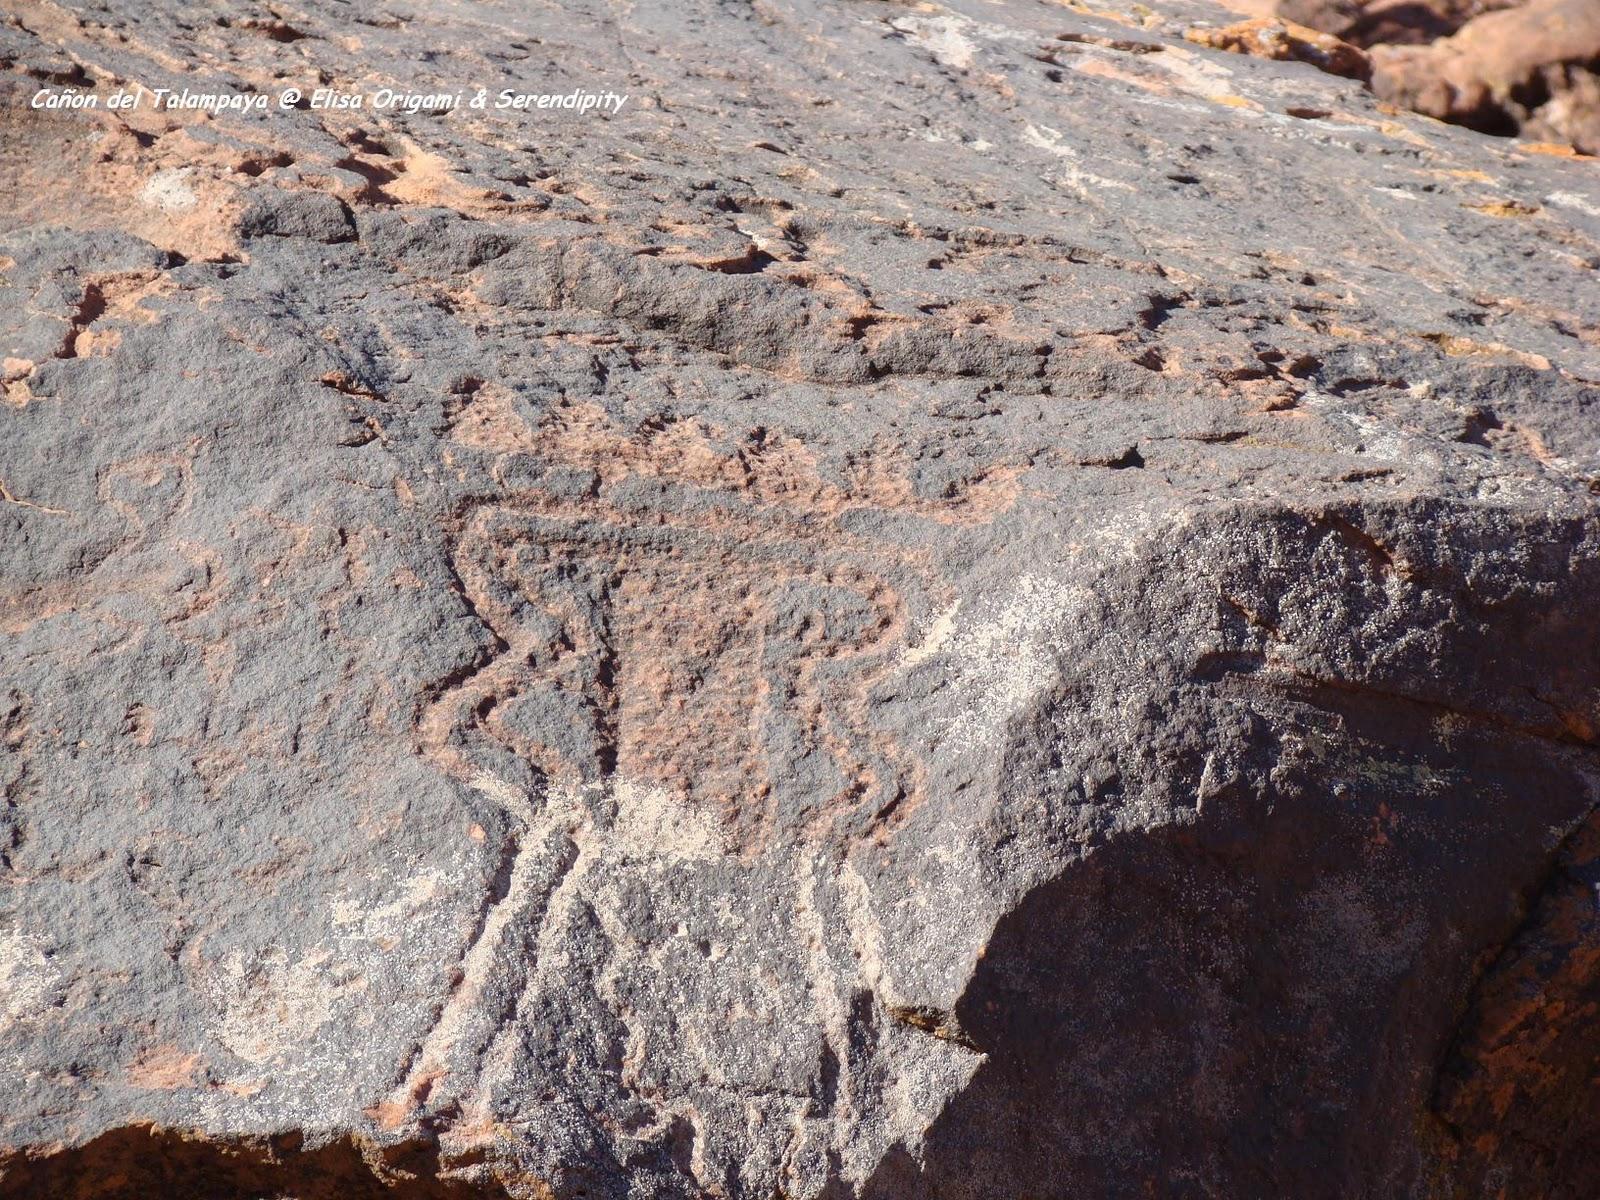 Petroglifos, morteros, Cañon del Talampaya, la rioja, Argentina, viajes, travel, travel blogger